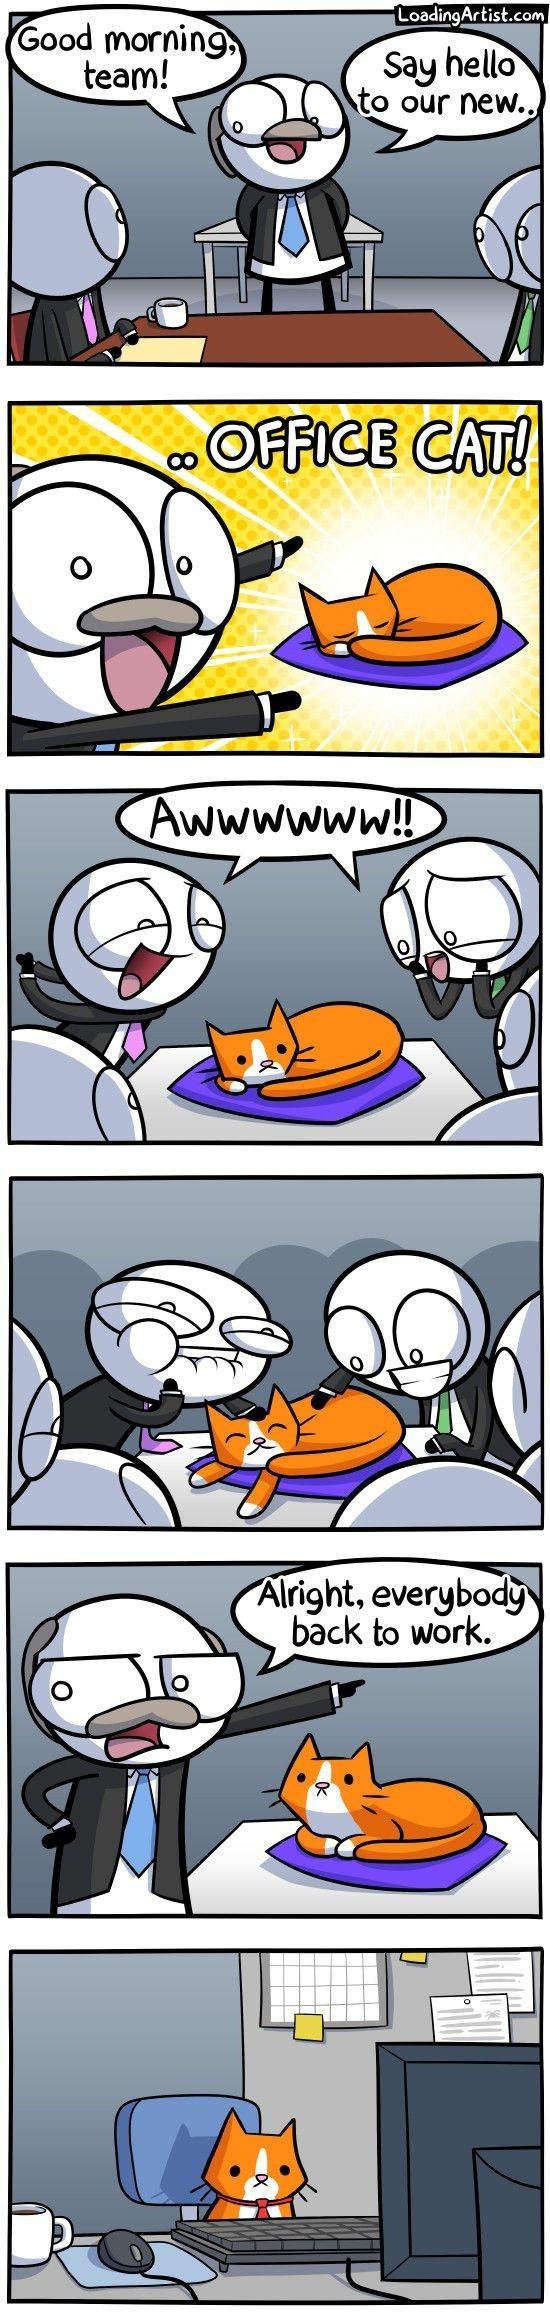 office cat comic